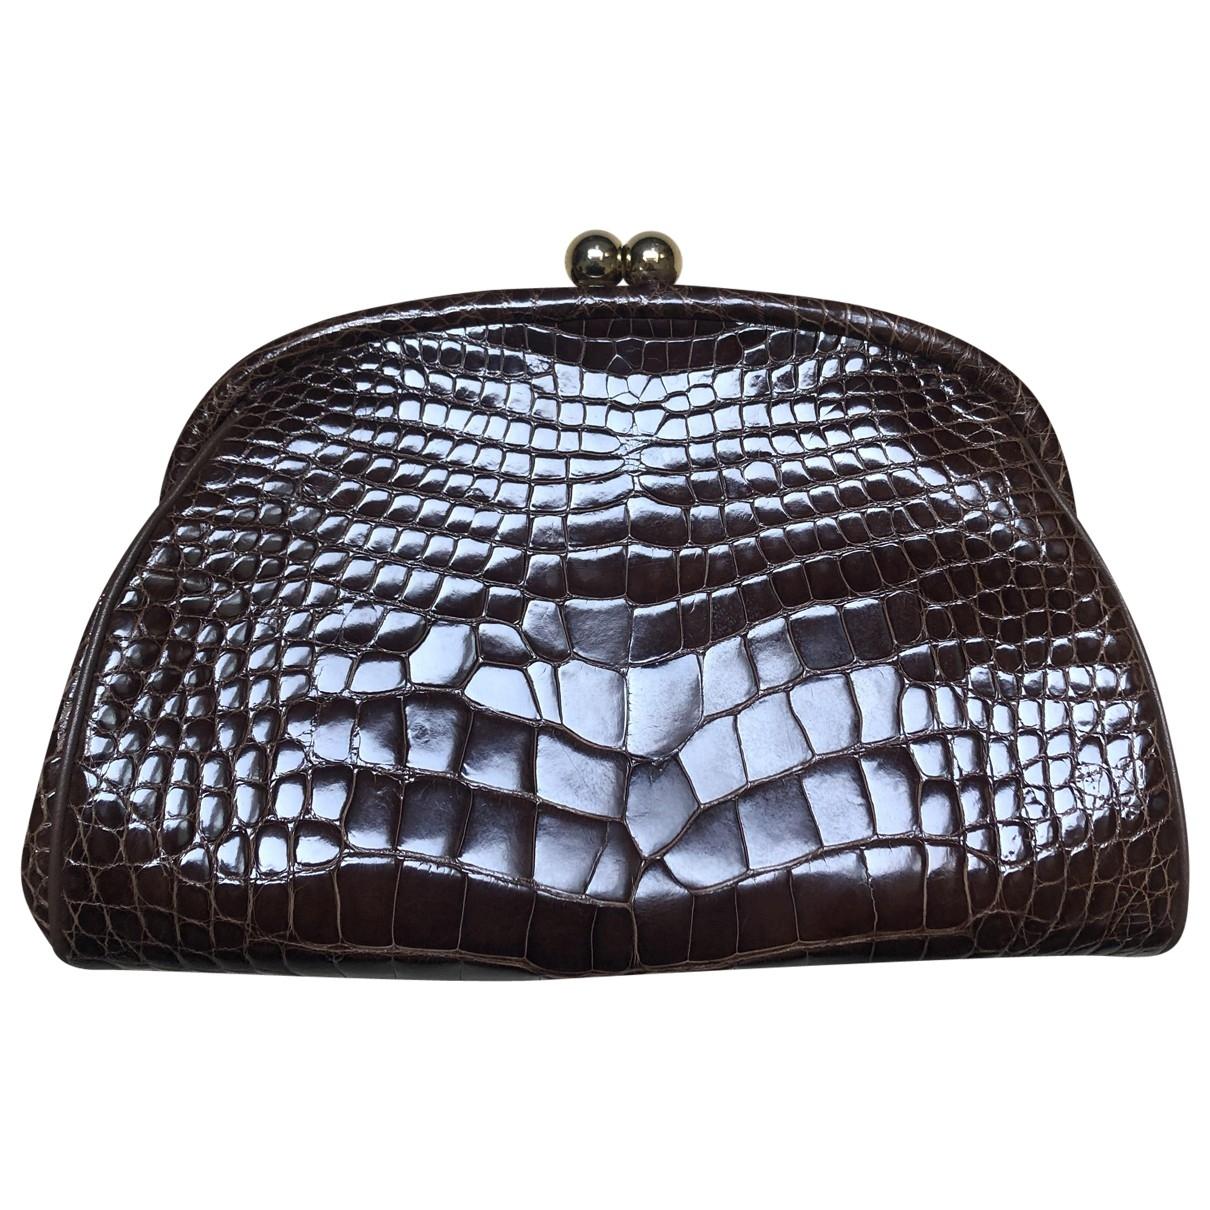 Colombo \N Brown Crocodile handbag for Women \N